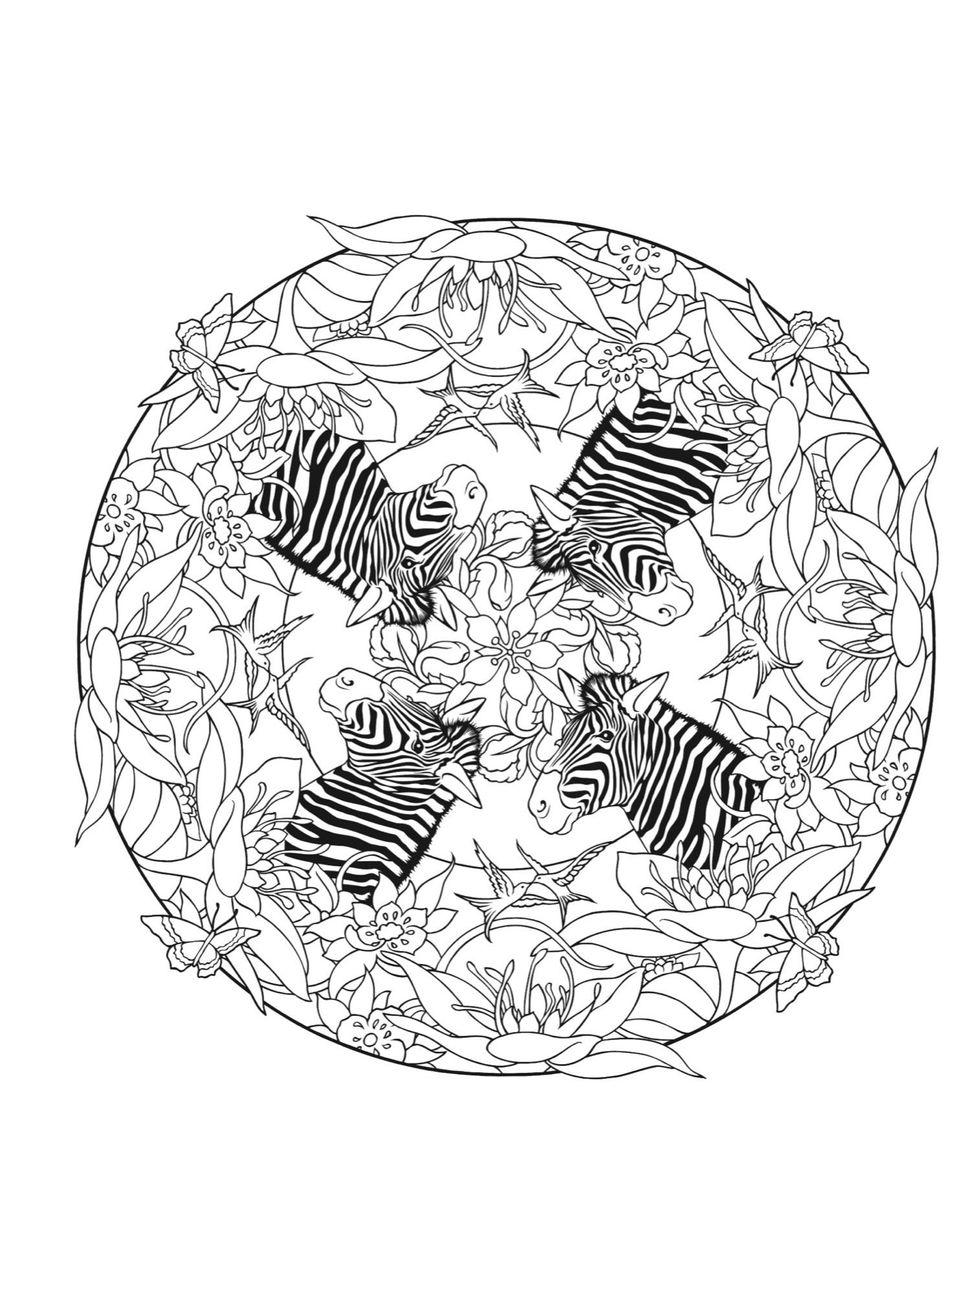 "<em><a href=""http://www.amazon.com/Creative-Haven-Mandala-Madness-Coloring/dp/0486781984/ref=sr_1_6?ie=UTF8&keywords=creative"